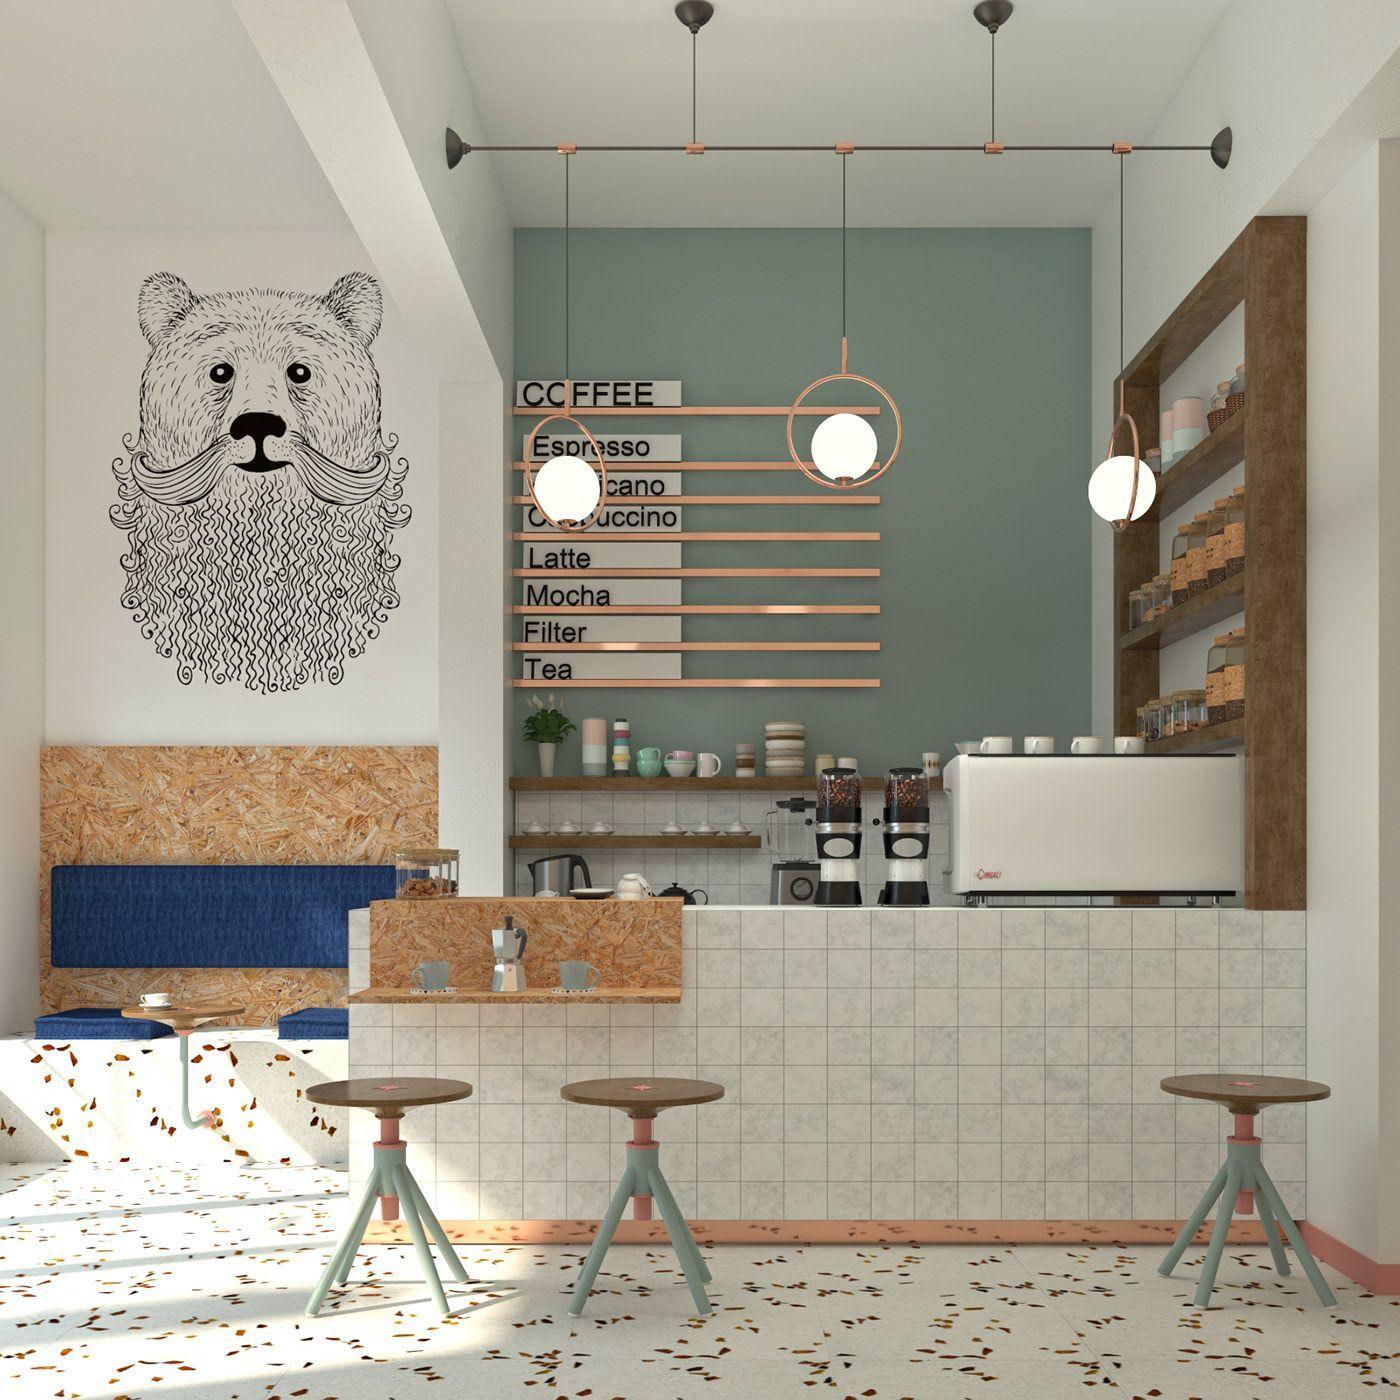 Sumatra Coffee Roasters Cafe Interior Design In 2020 Cafe Interior Design Coffee Shop Design Cafe Interior